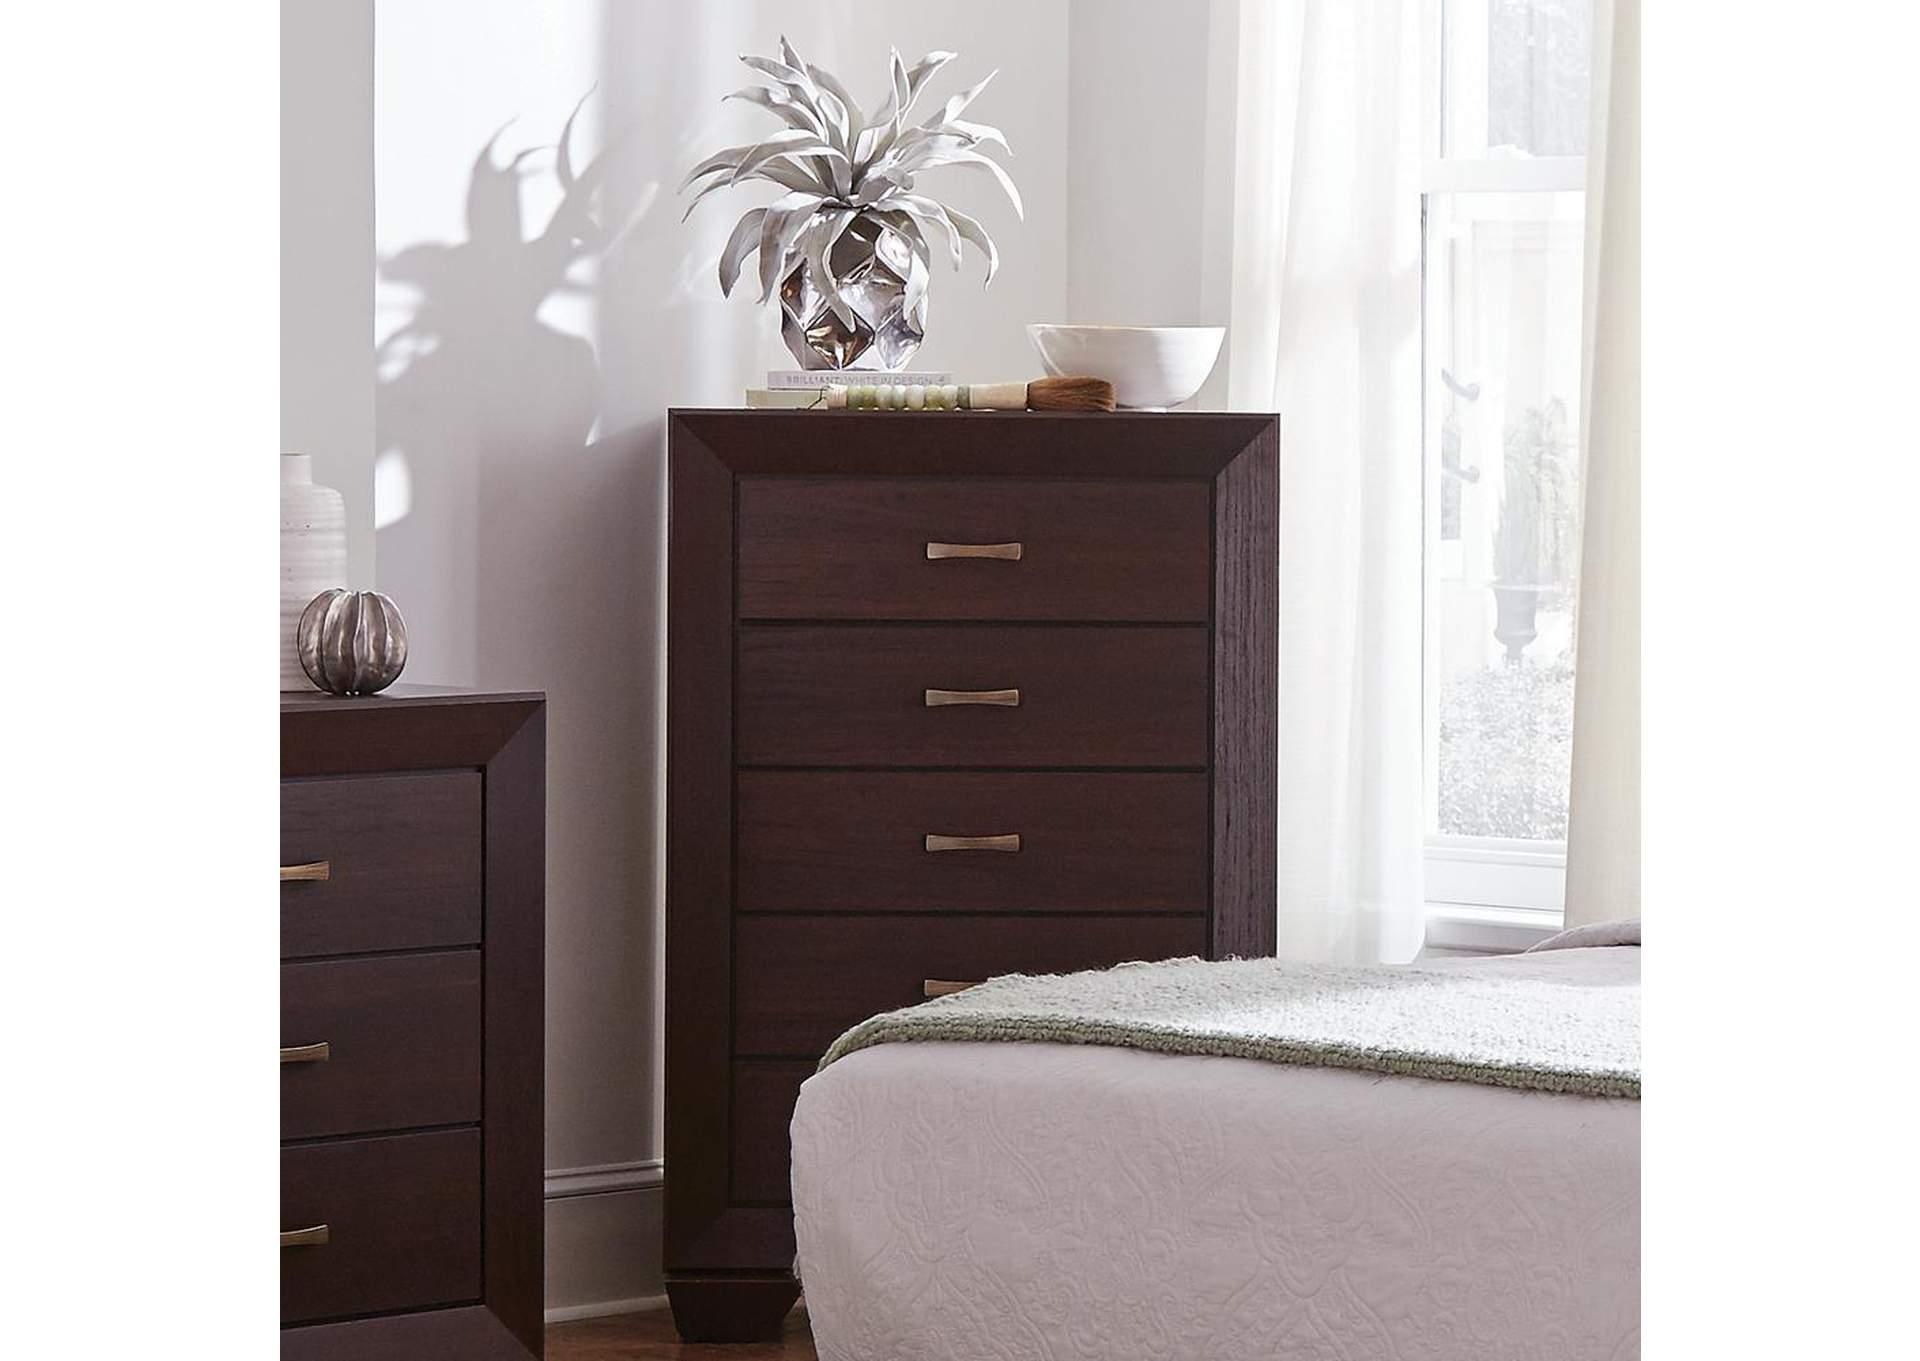 Jericho Jerusalem Furniture Bronx Ny Dark Cocoa Drawer Chest